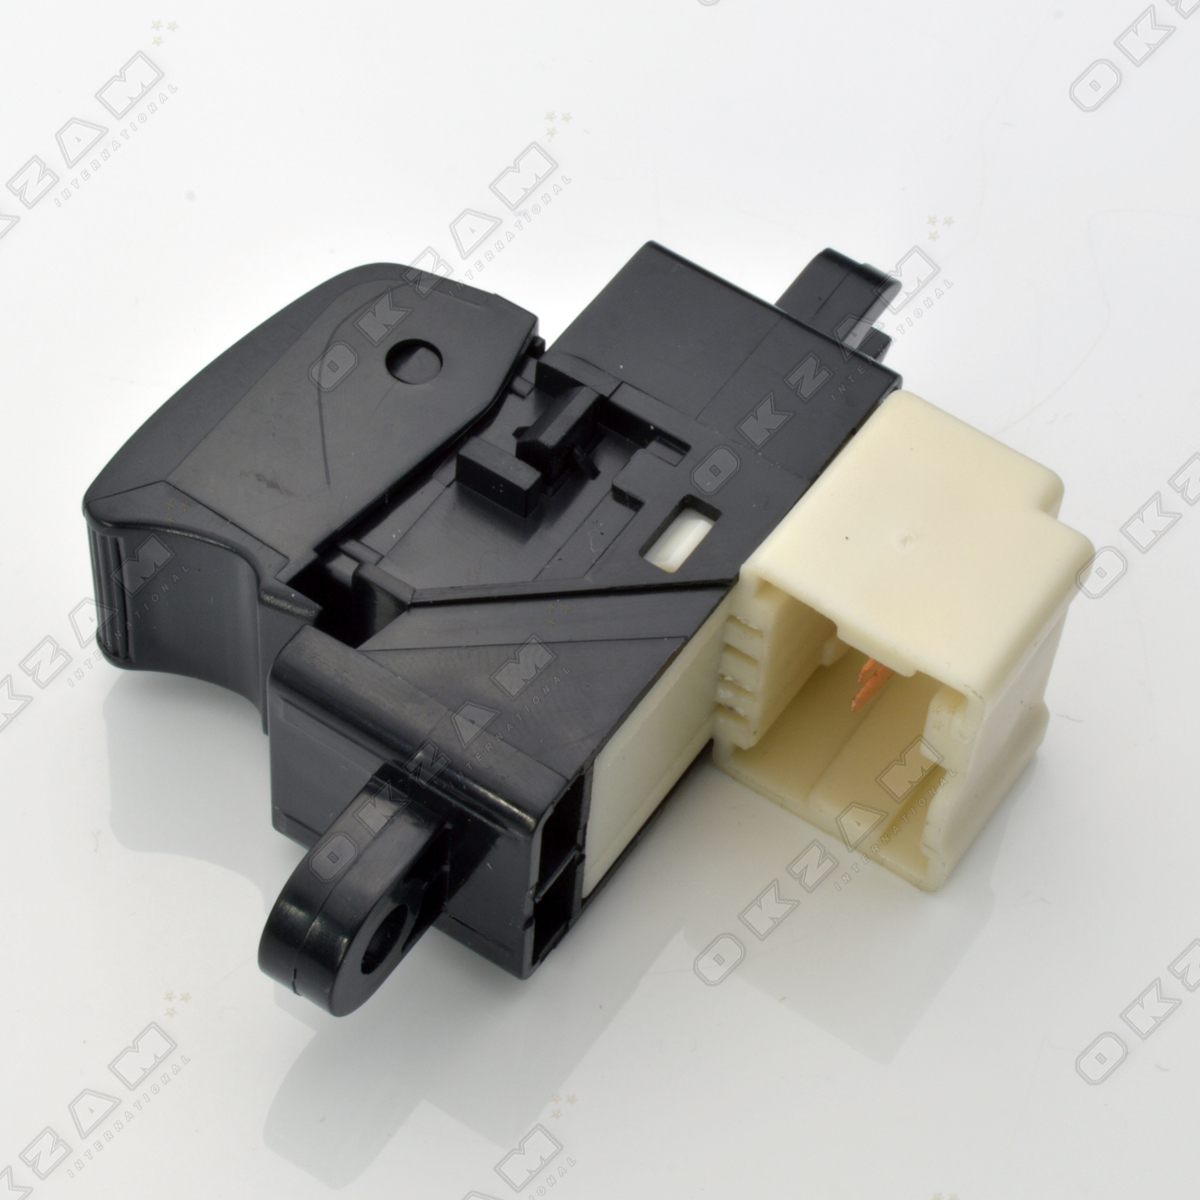 interrupteur l ve vitre lectrique pour nissan terrano ii pathfinder ebay. Black Bedroom Furniture Sets. Home Design Ideas